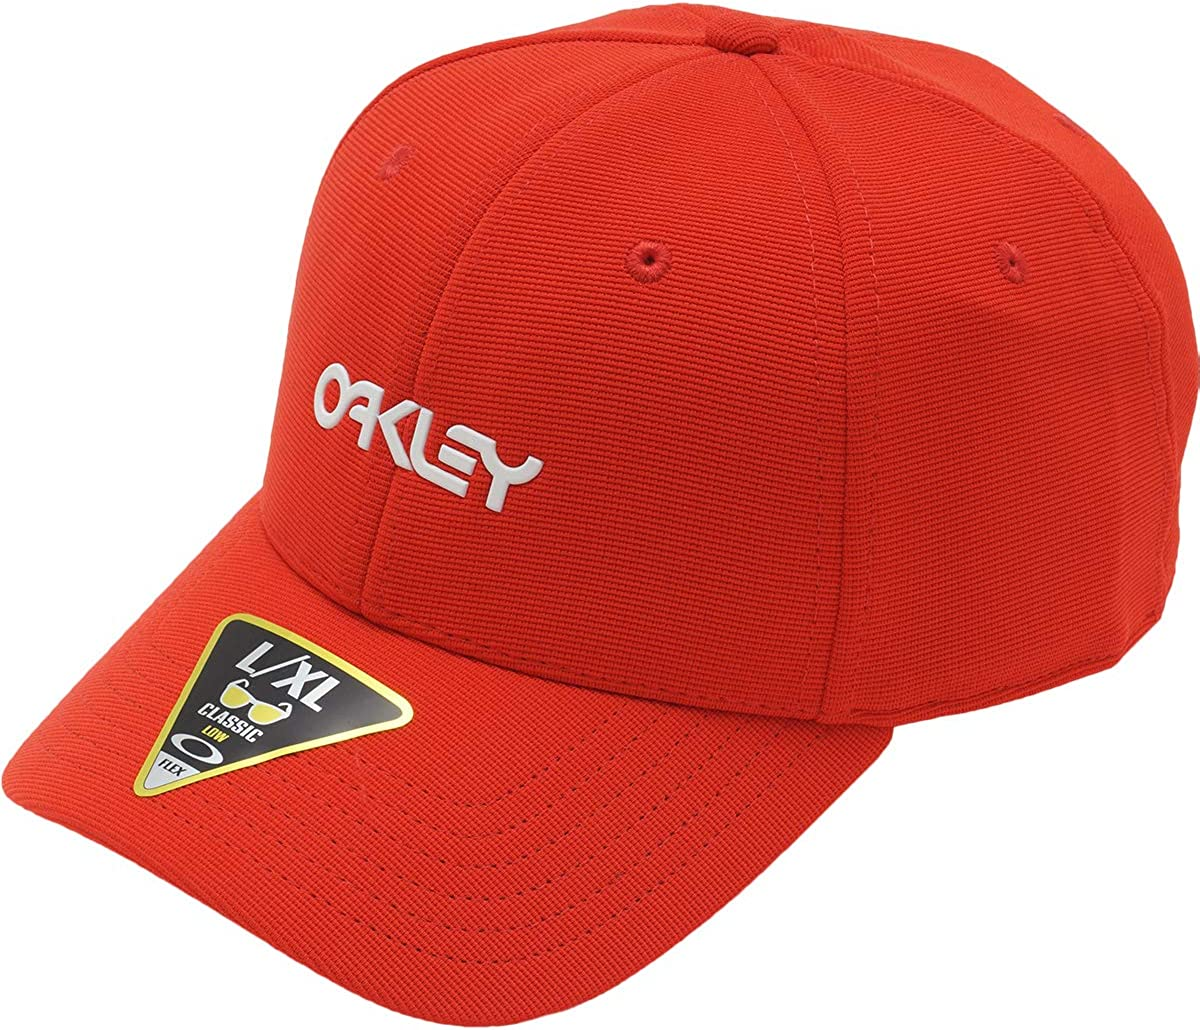 Oakley 6 Panel Hat Metallic